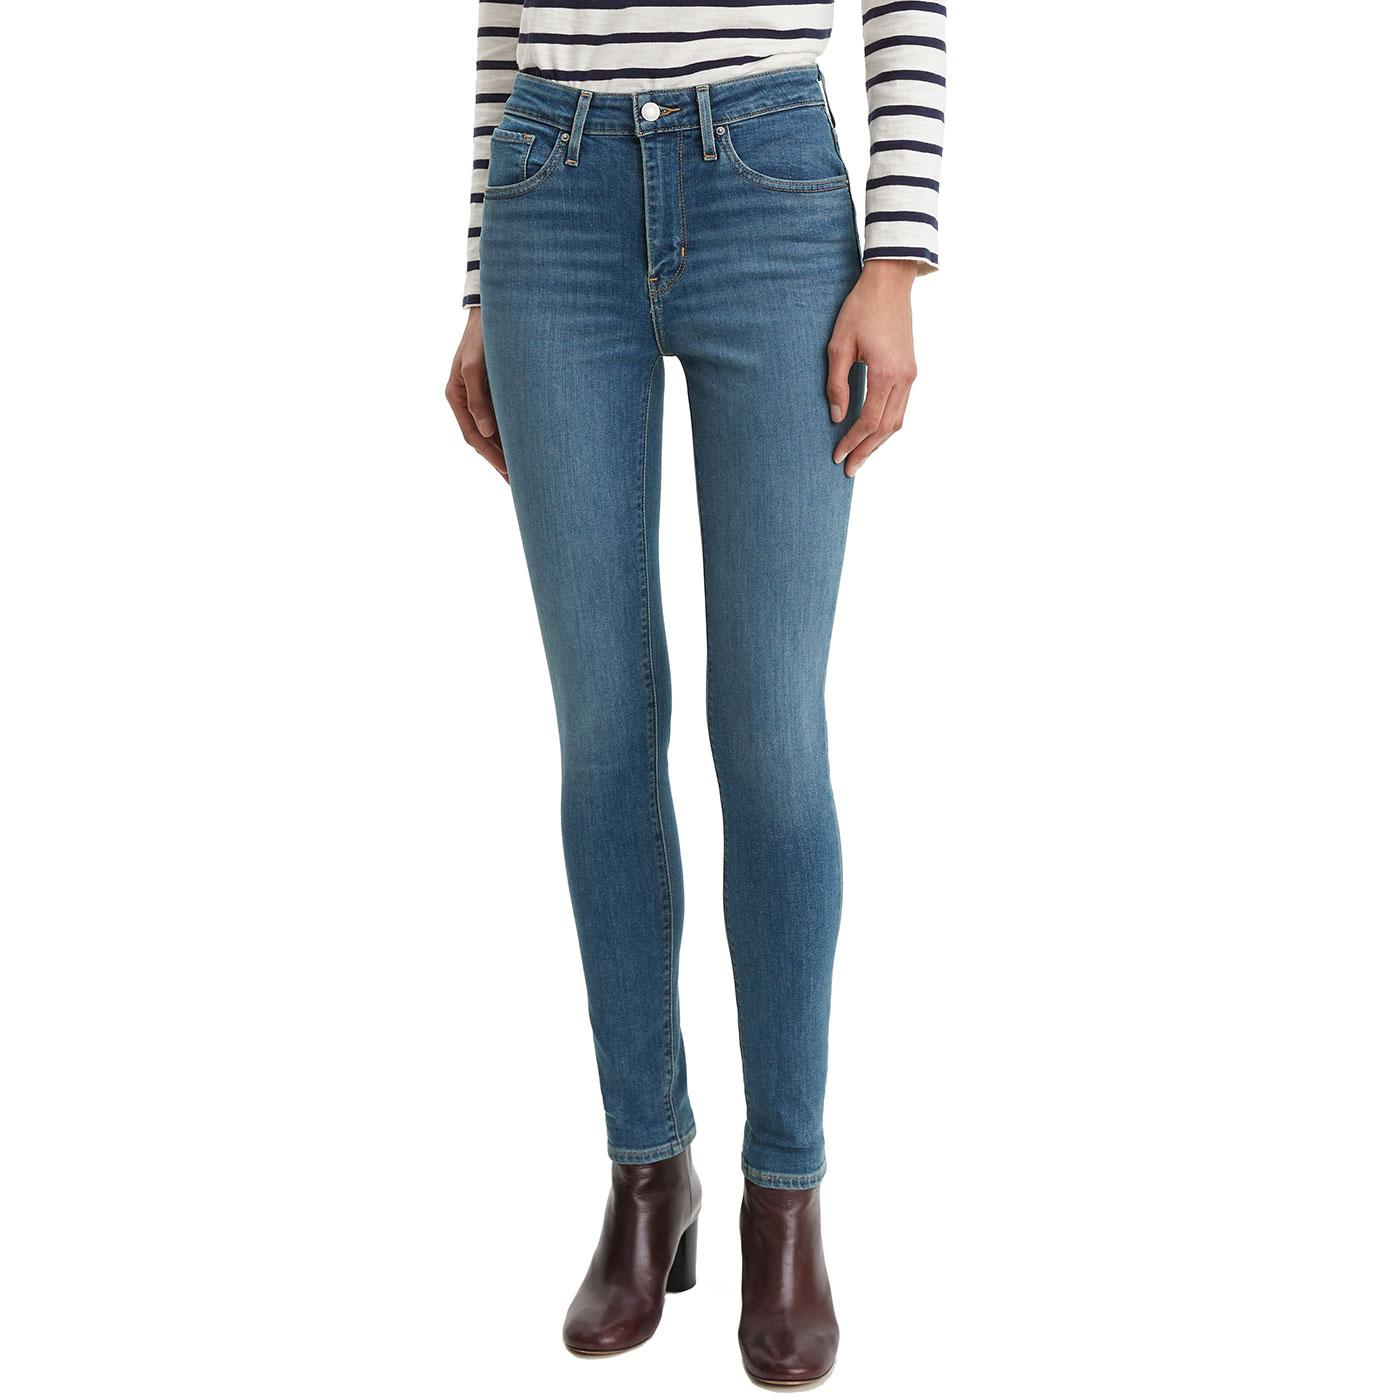 LEVI'S 721 High Rise Skinny Jeans LOS ANGELES SUN